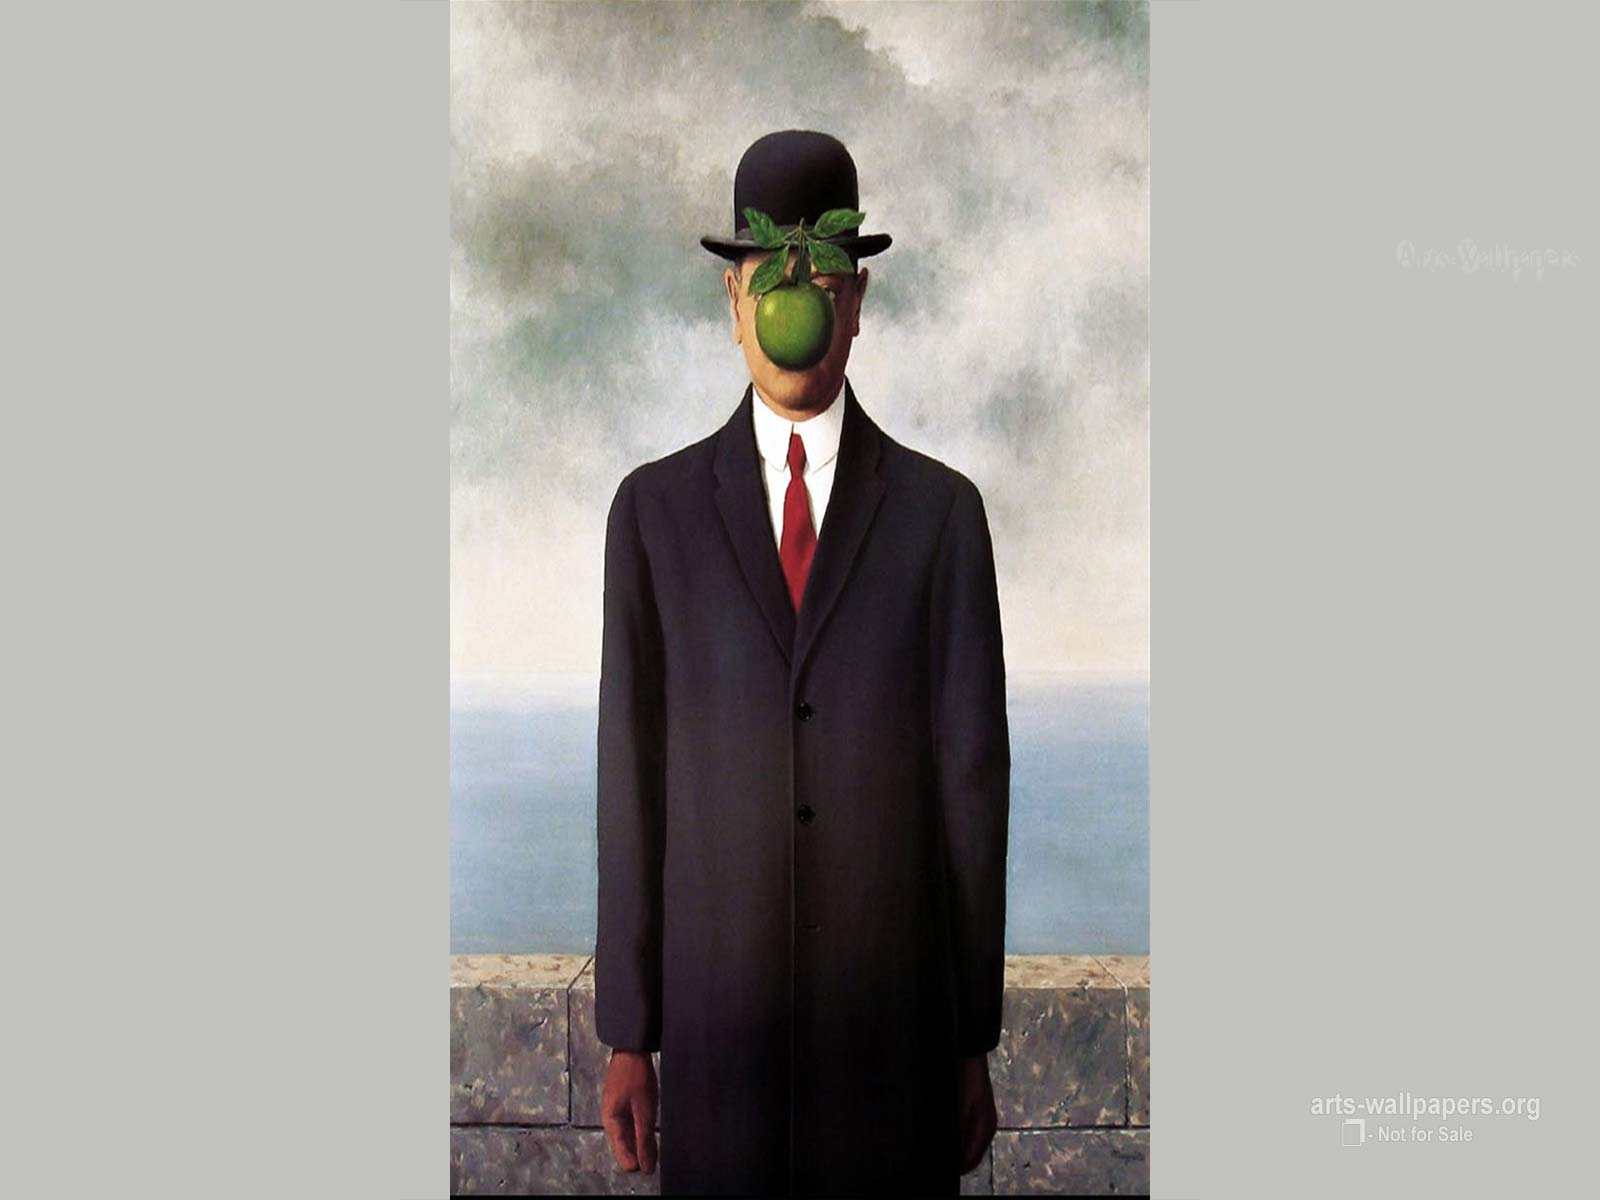 Rene Magritte Wallpapers Paintings Art Wallpapers Desktop Art 1600x1200